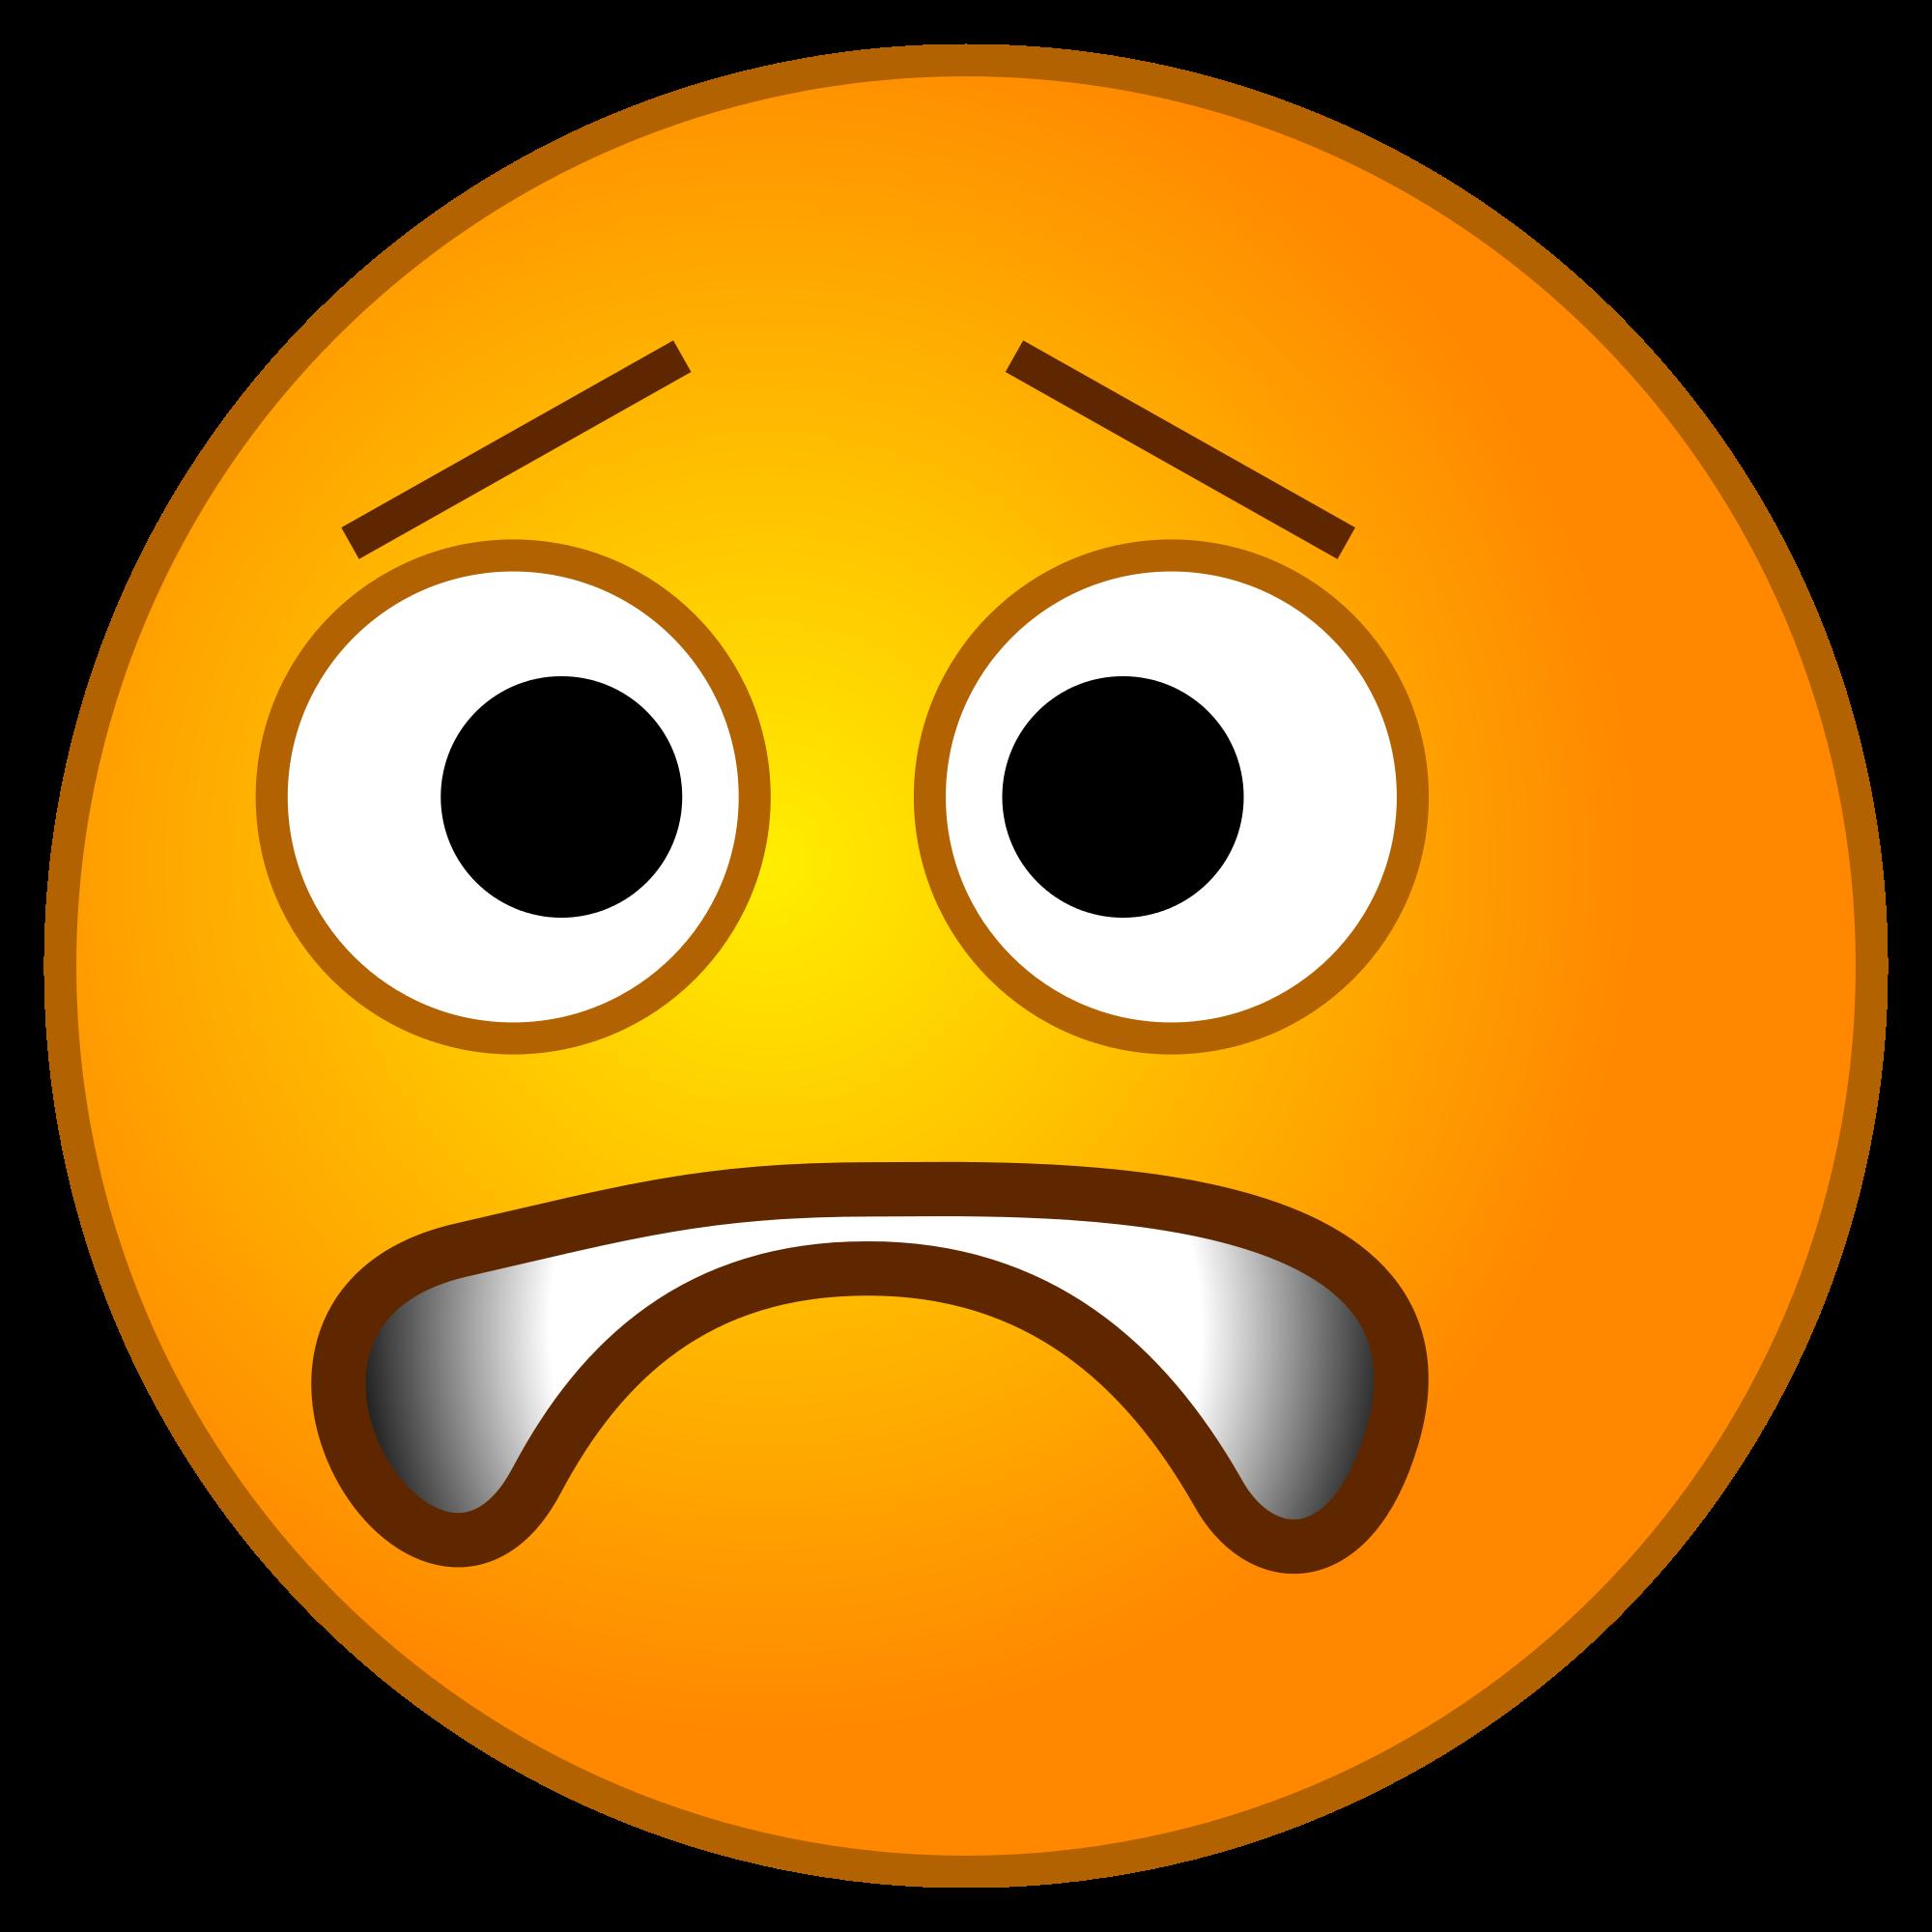 Emoji copy paste art. Emotions clipart worried